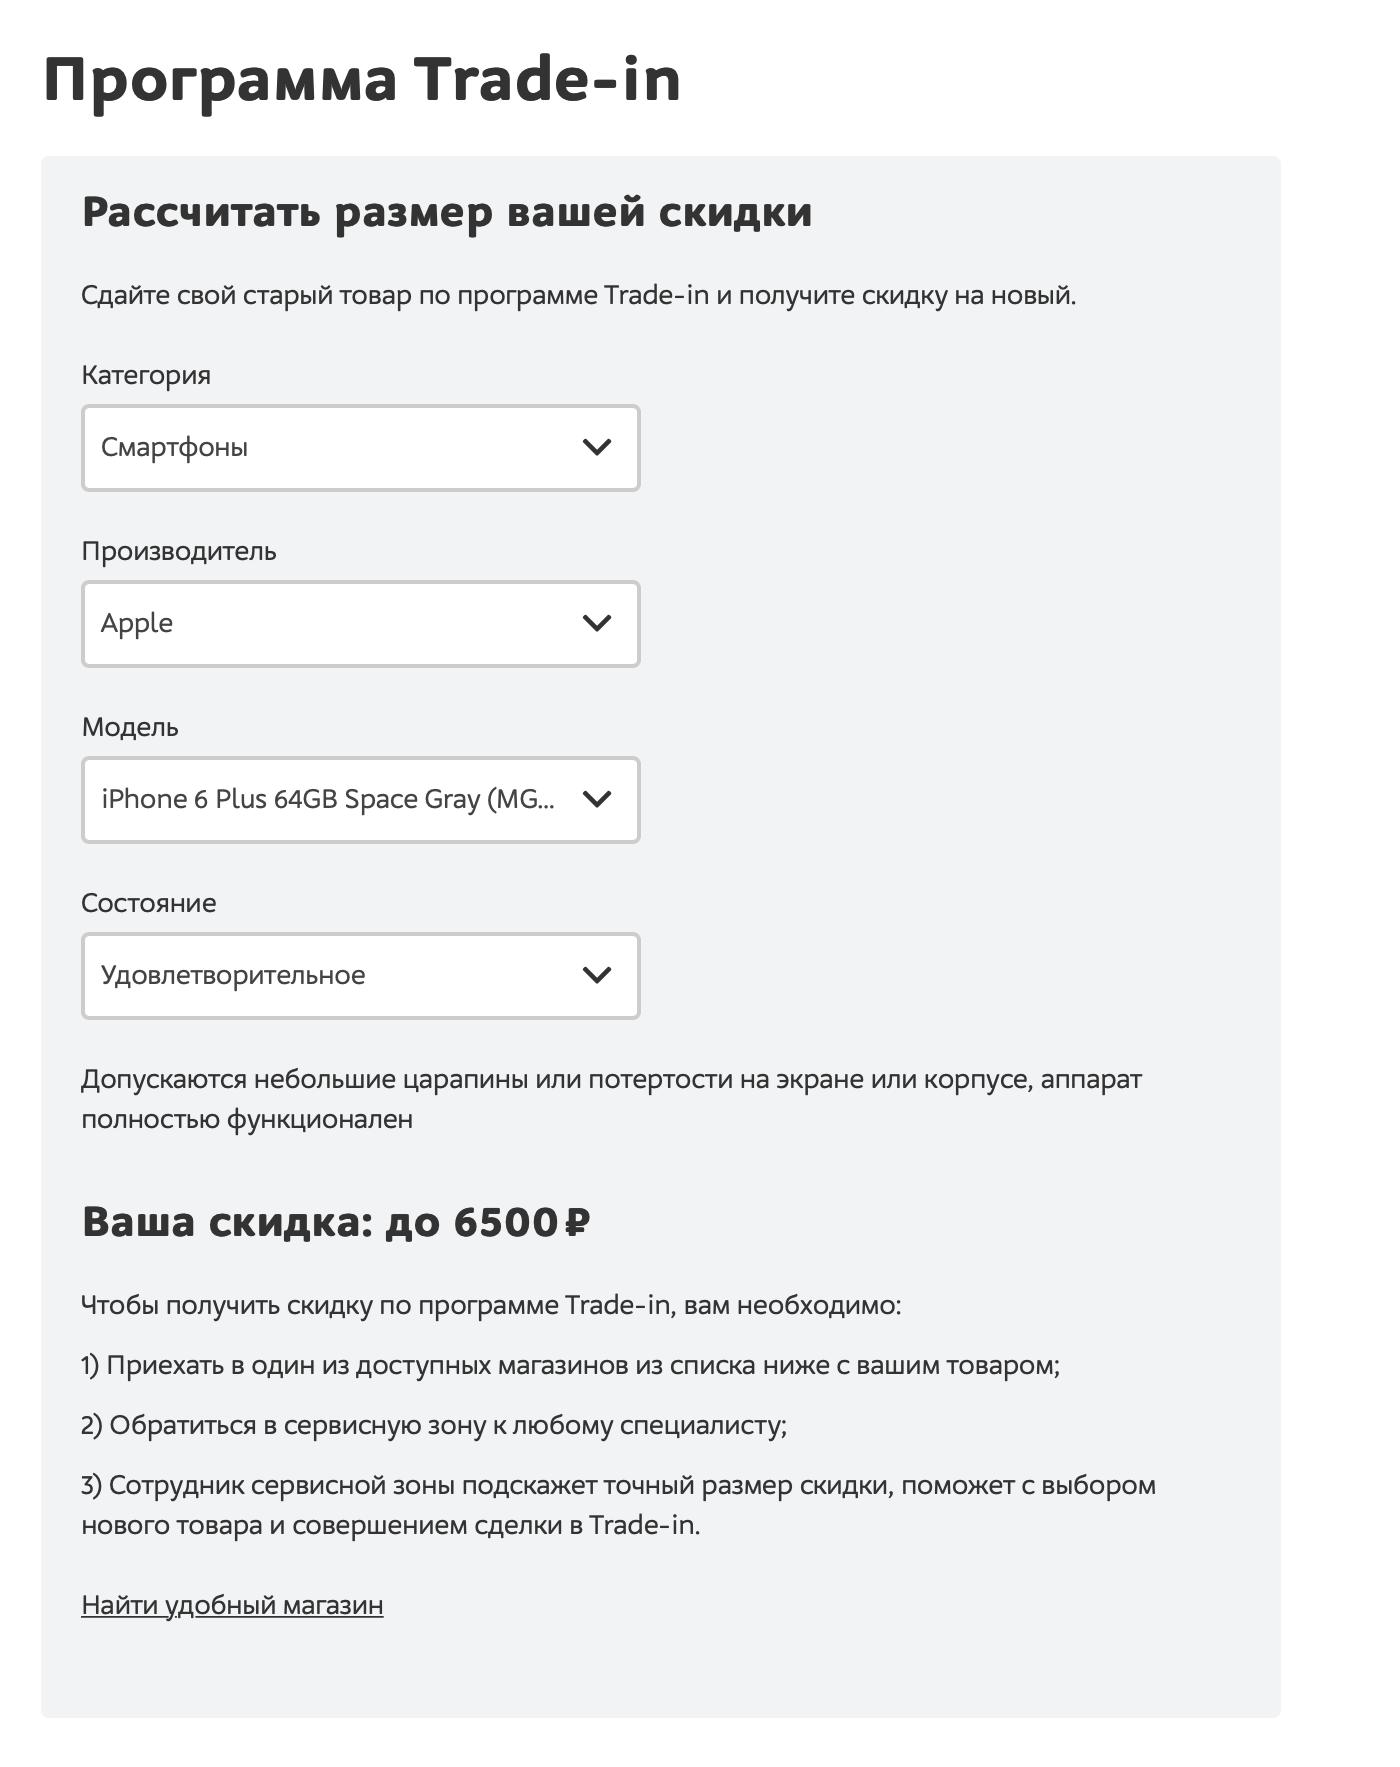 За iPhone 6s 64GB дадут максимум 5100<span class=ruble>Р</span> — точную сумму назовет консультант после оценки